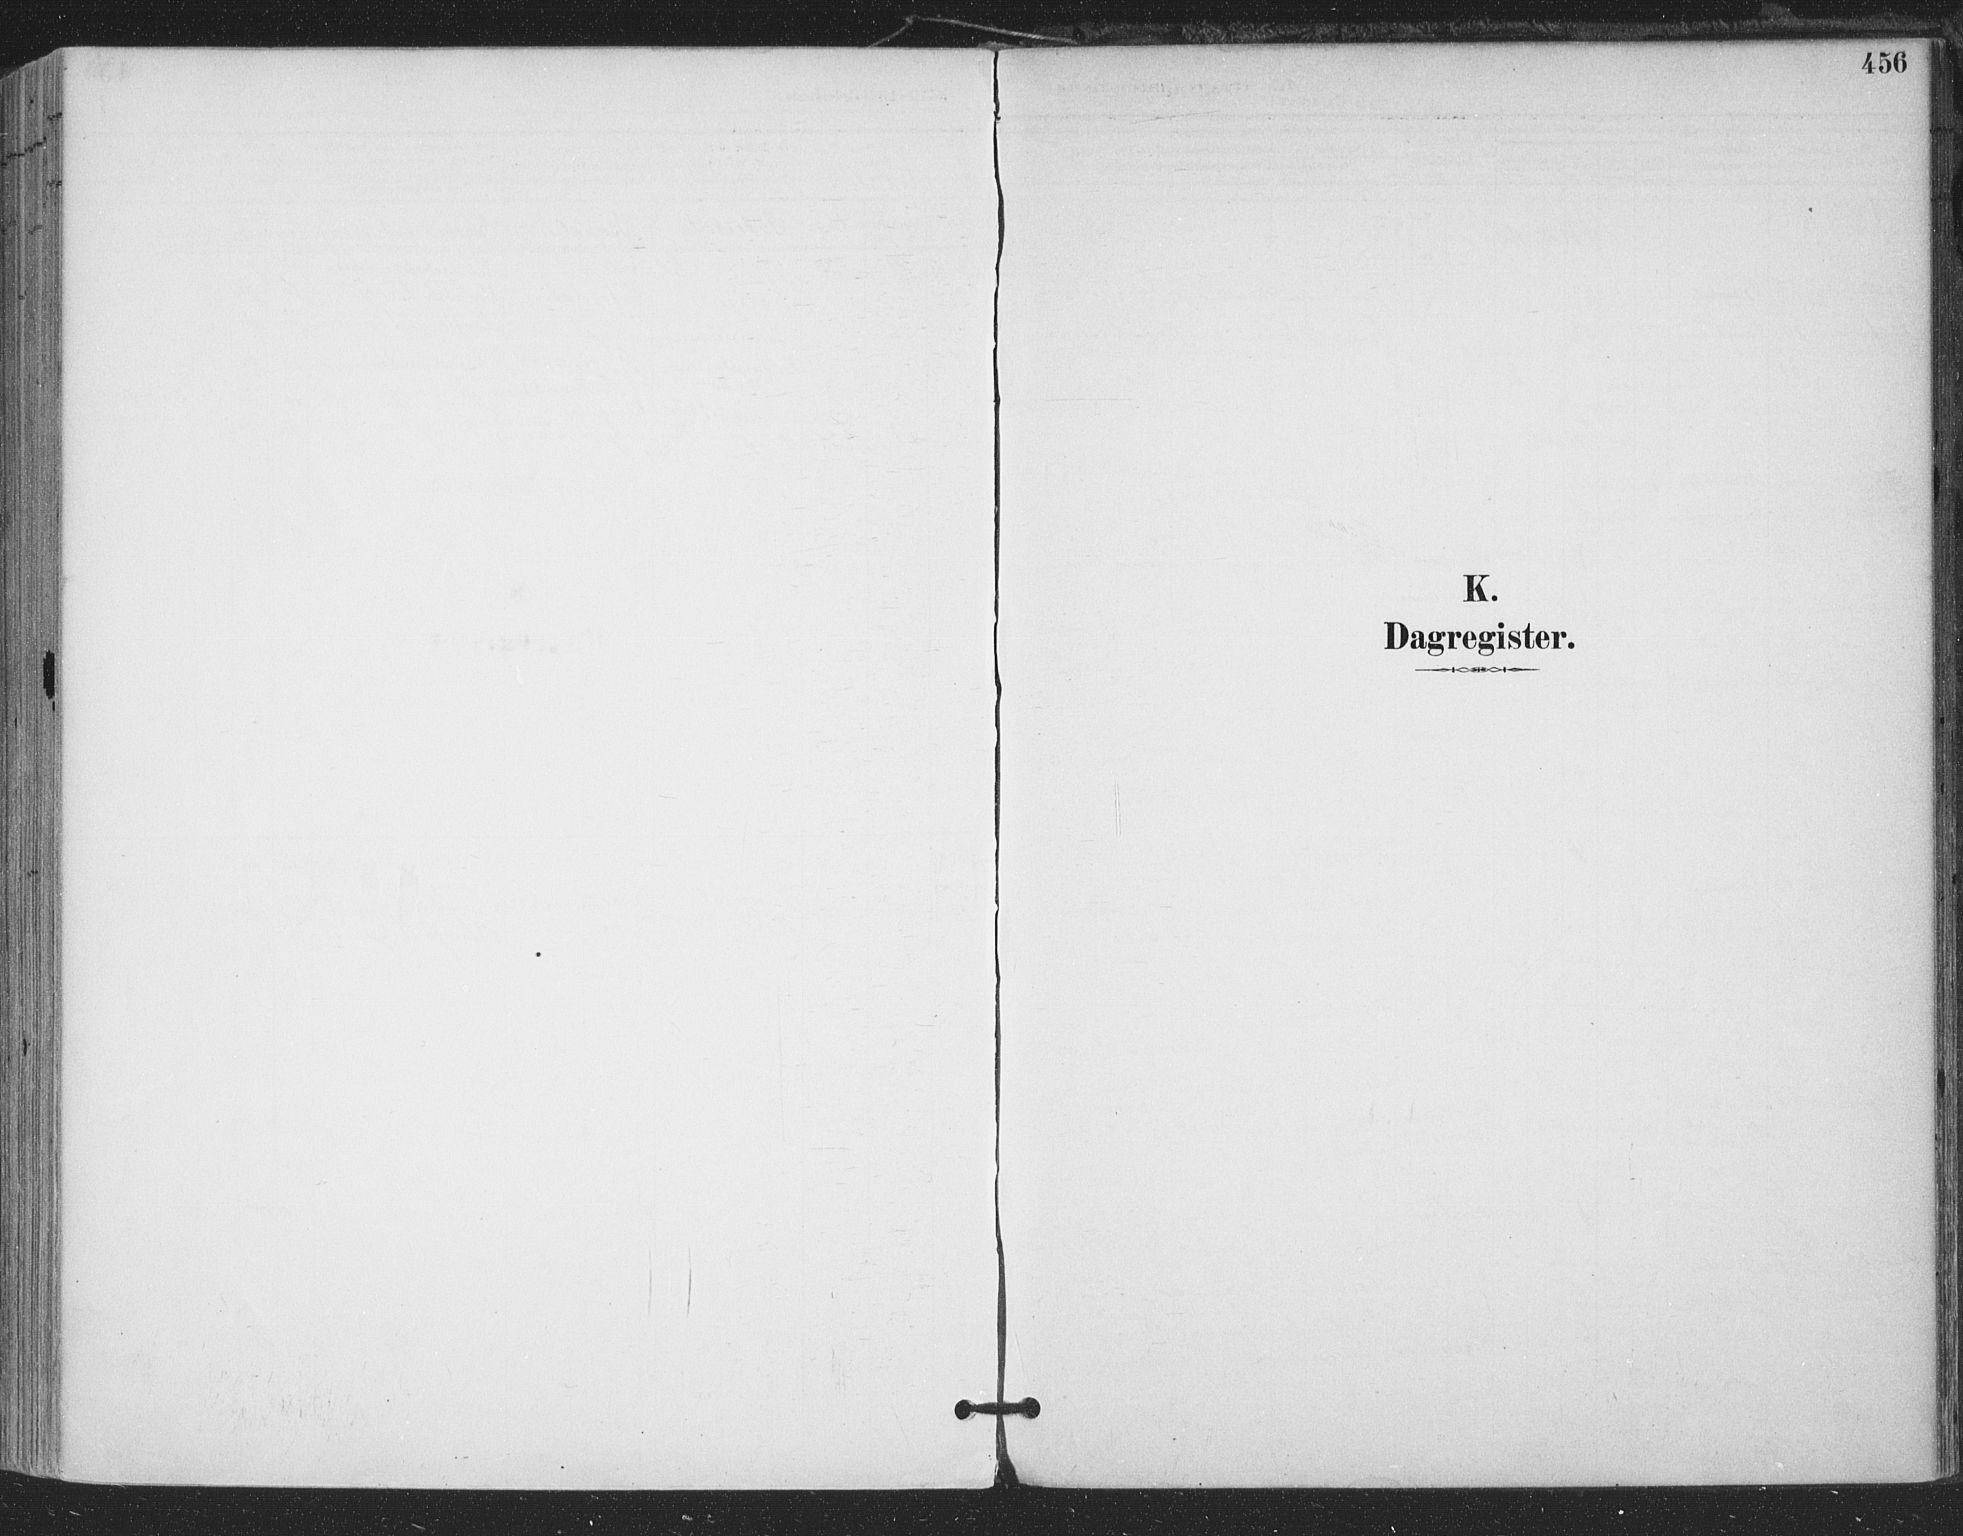 SAKO, Bamble kirkebøker, F/Fa/L0008: Ministerialbok nr. I 8, 1888-1900, s. 456